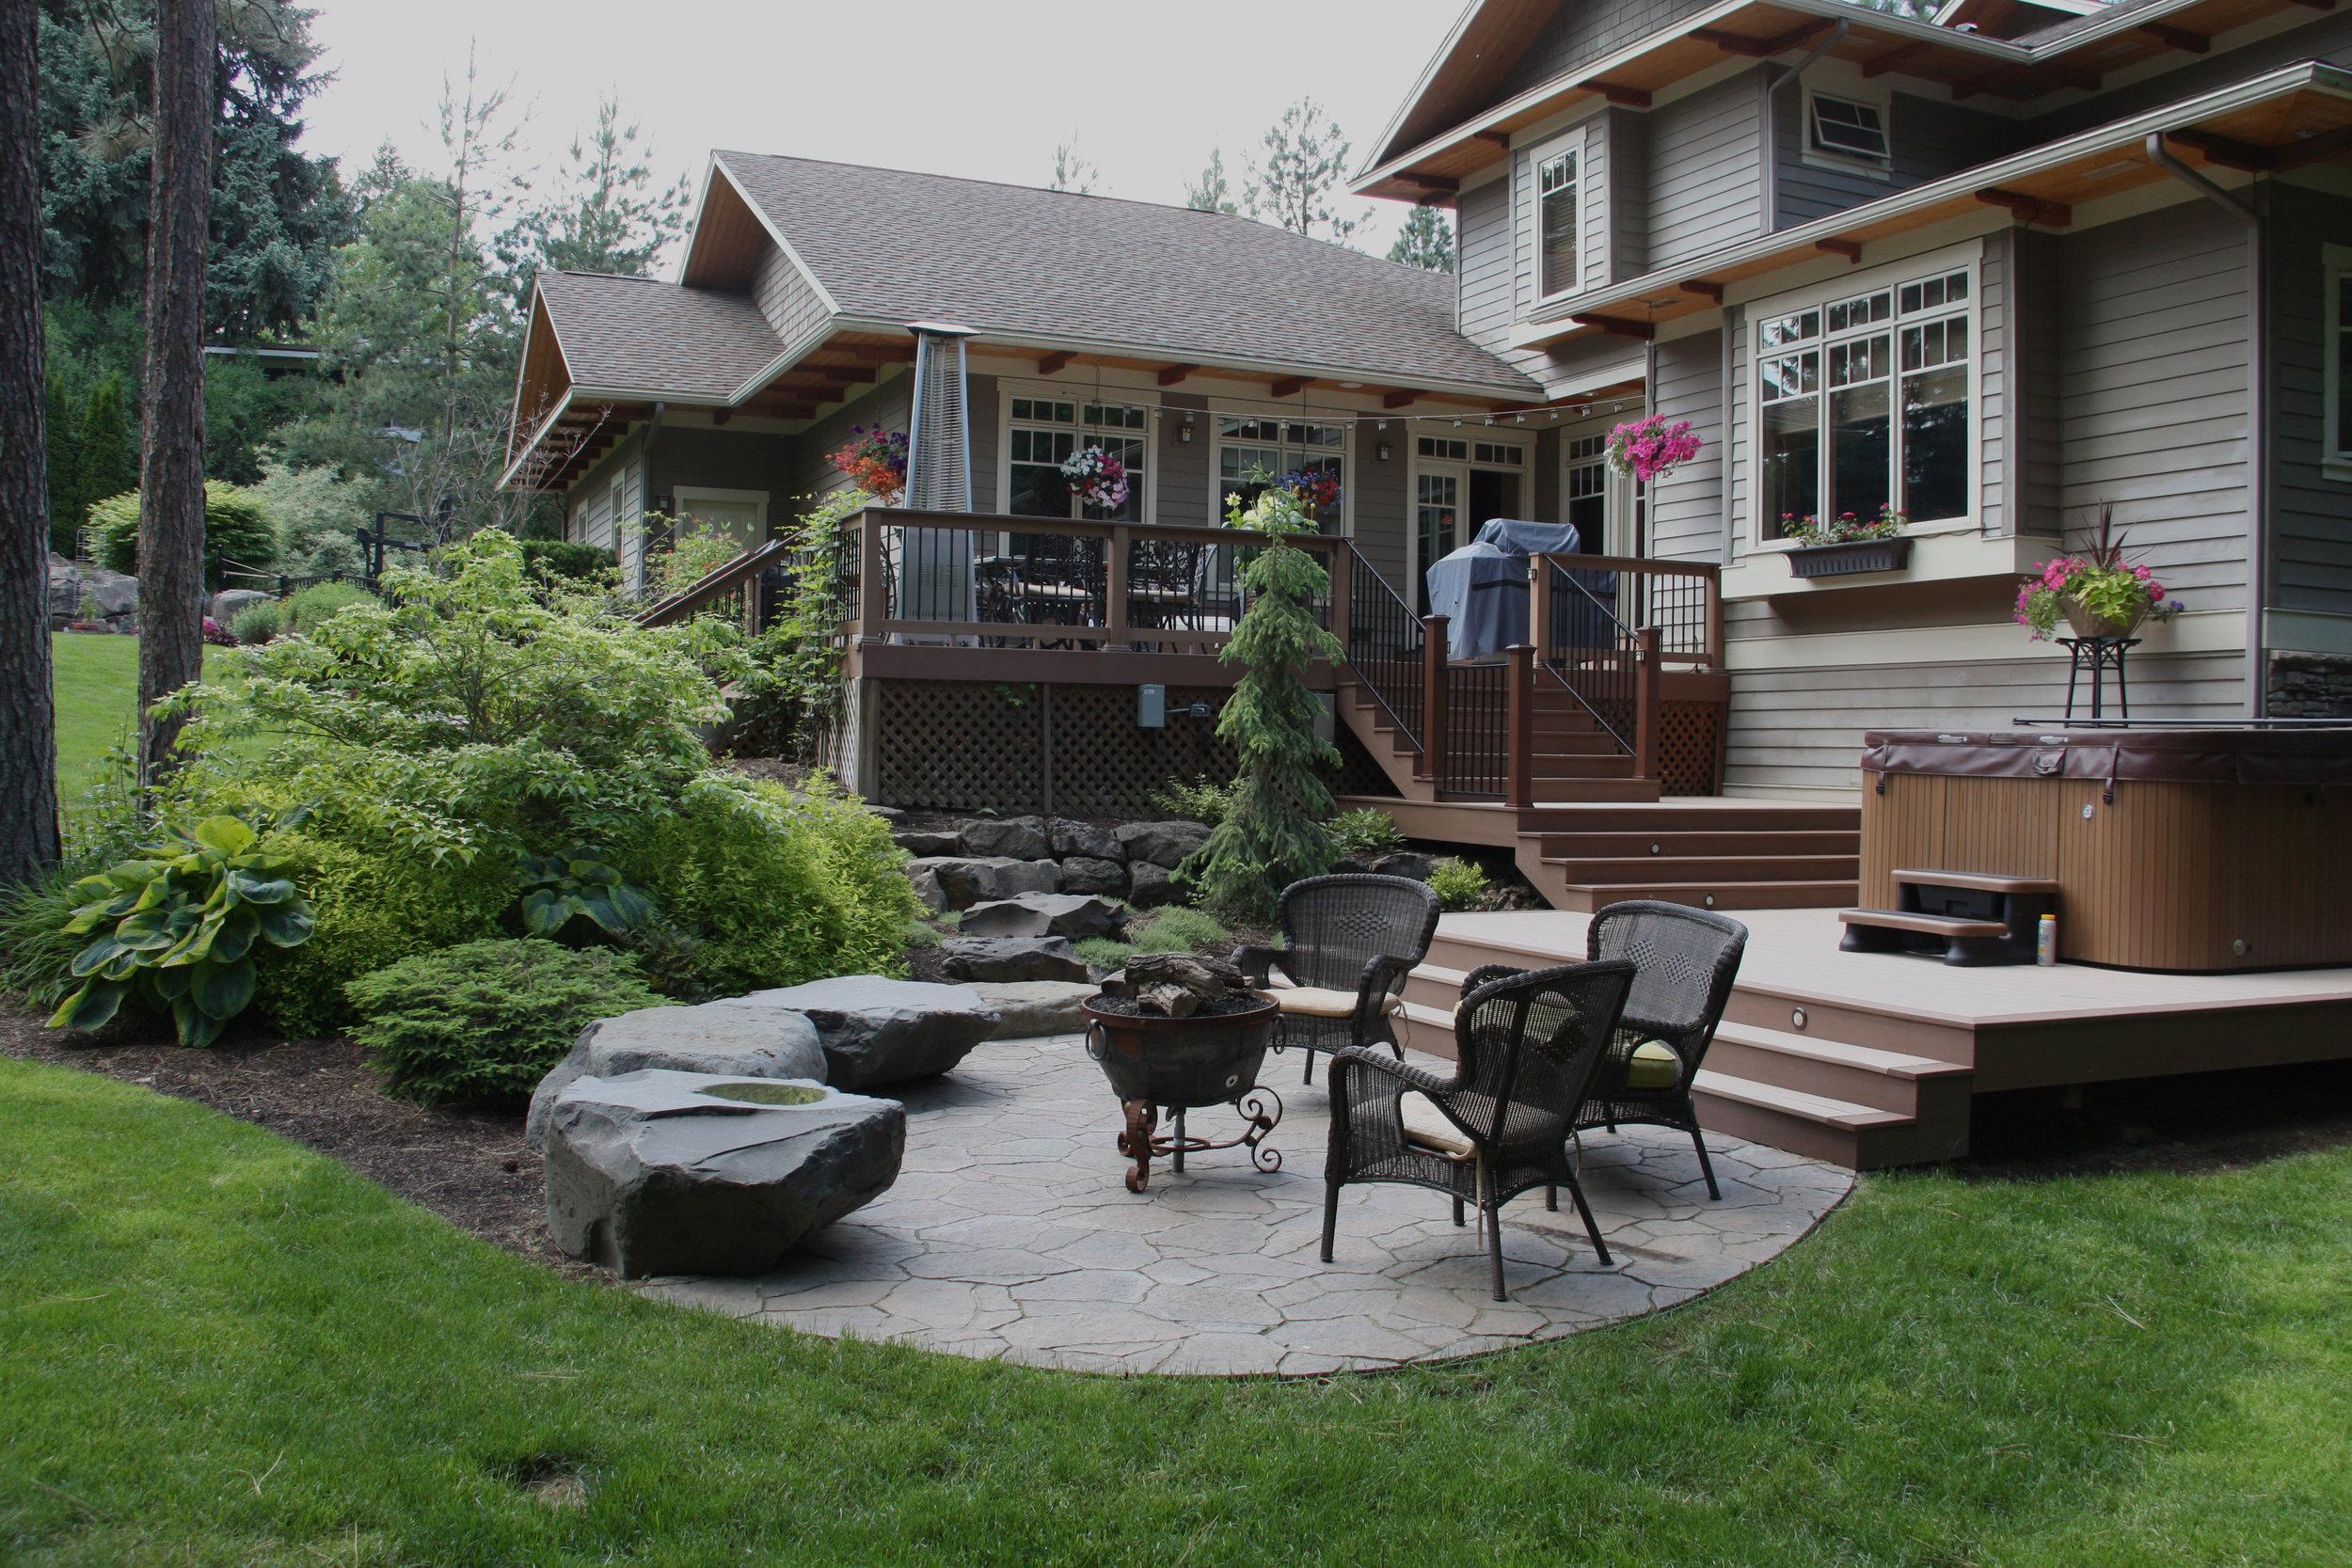 belgard-mega-arbel-paver-patio.JPG